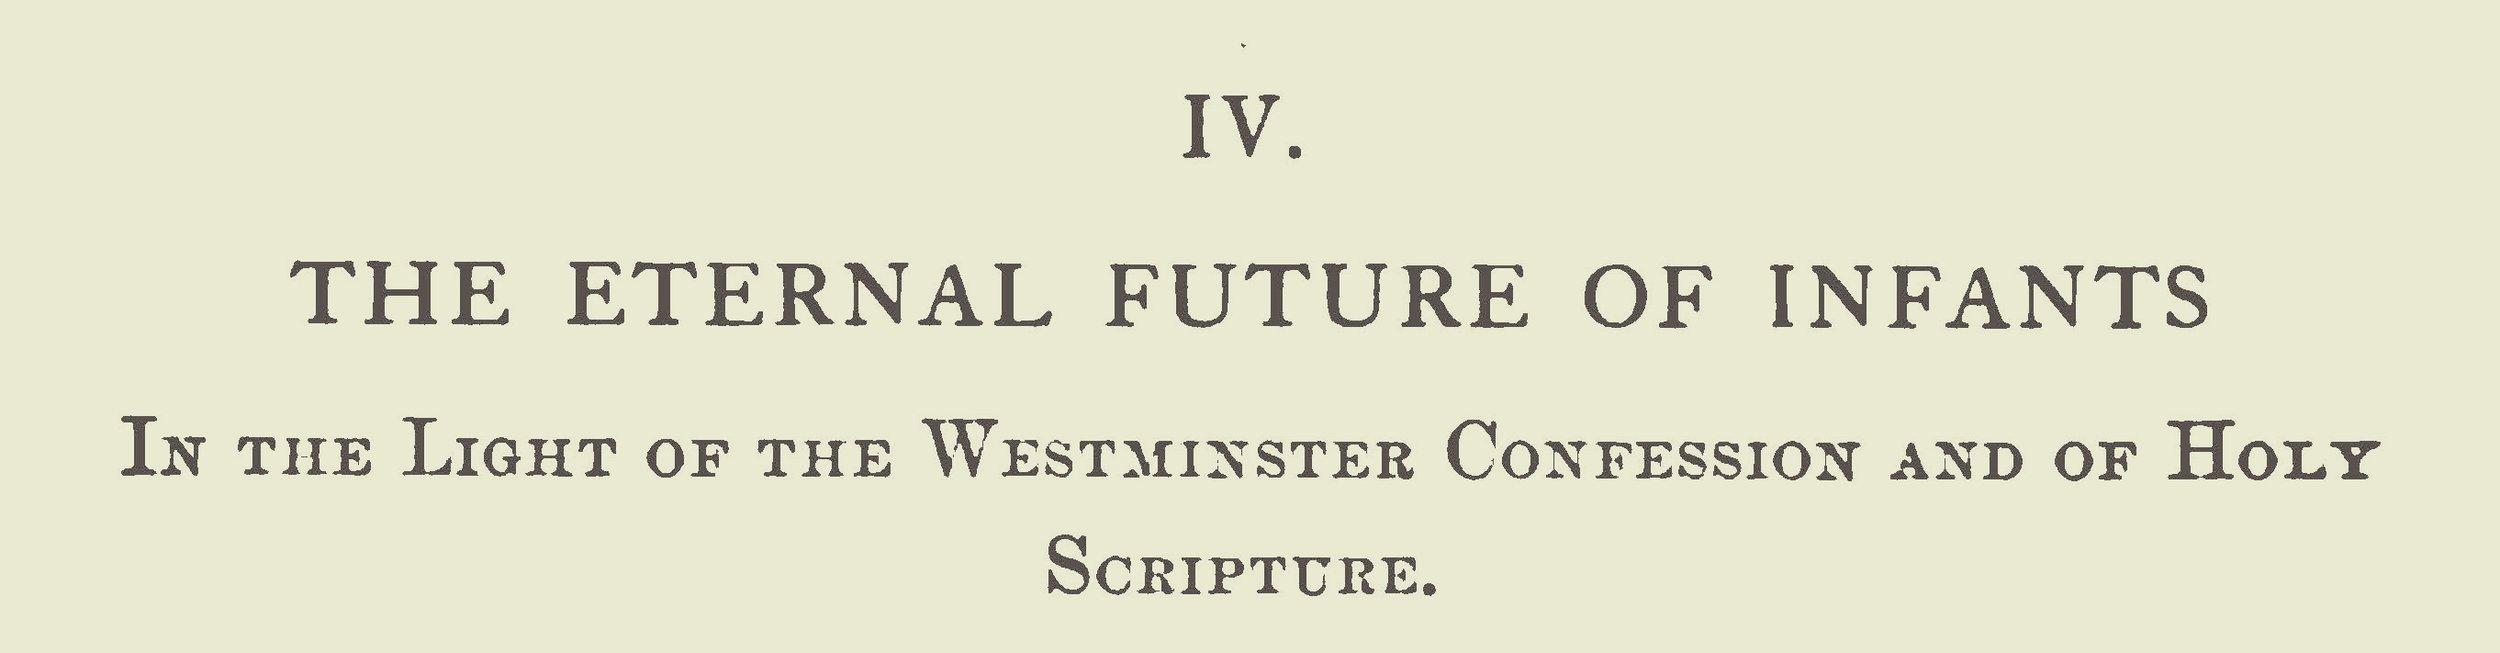 Mallard, Robert Quarterman, The Eternal Future of Infants Title Page.jpg